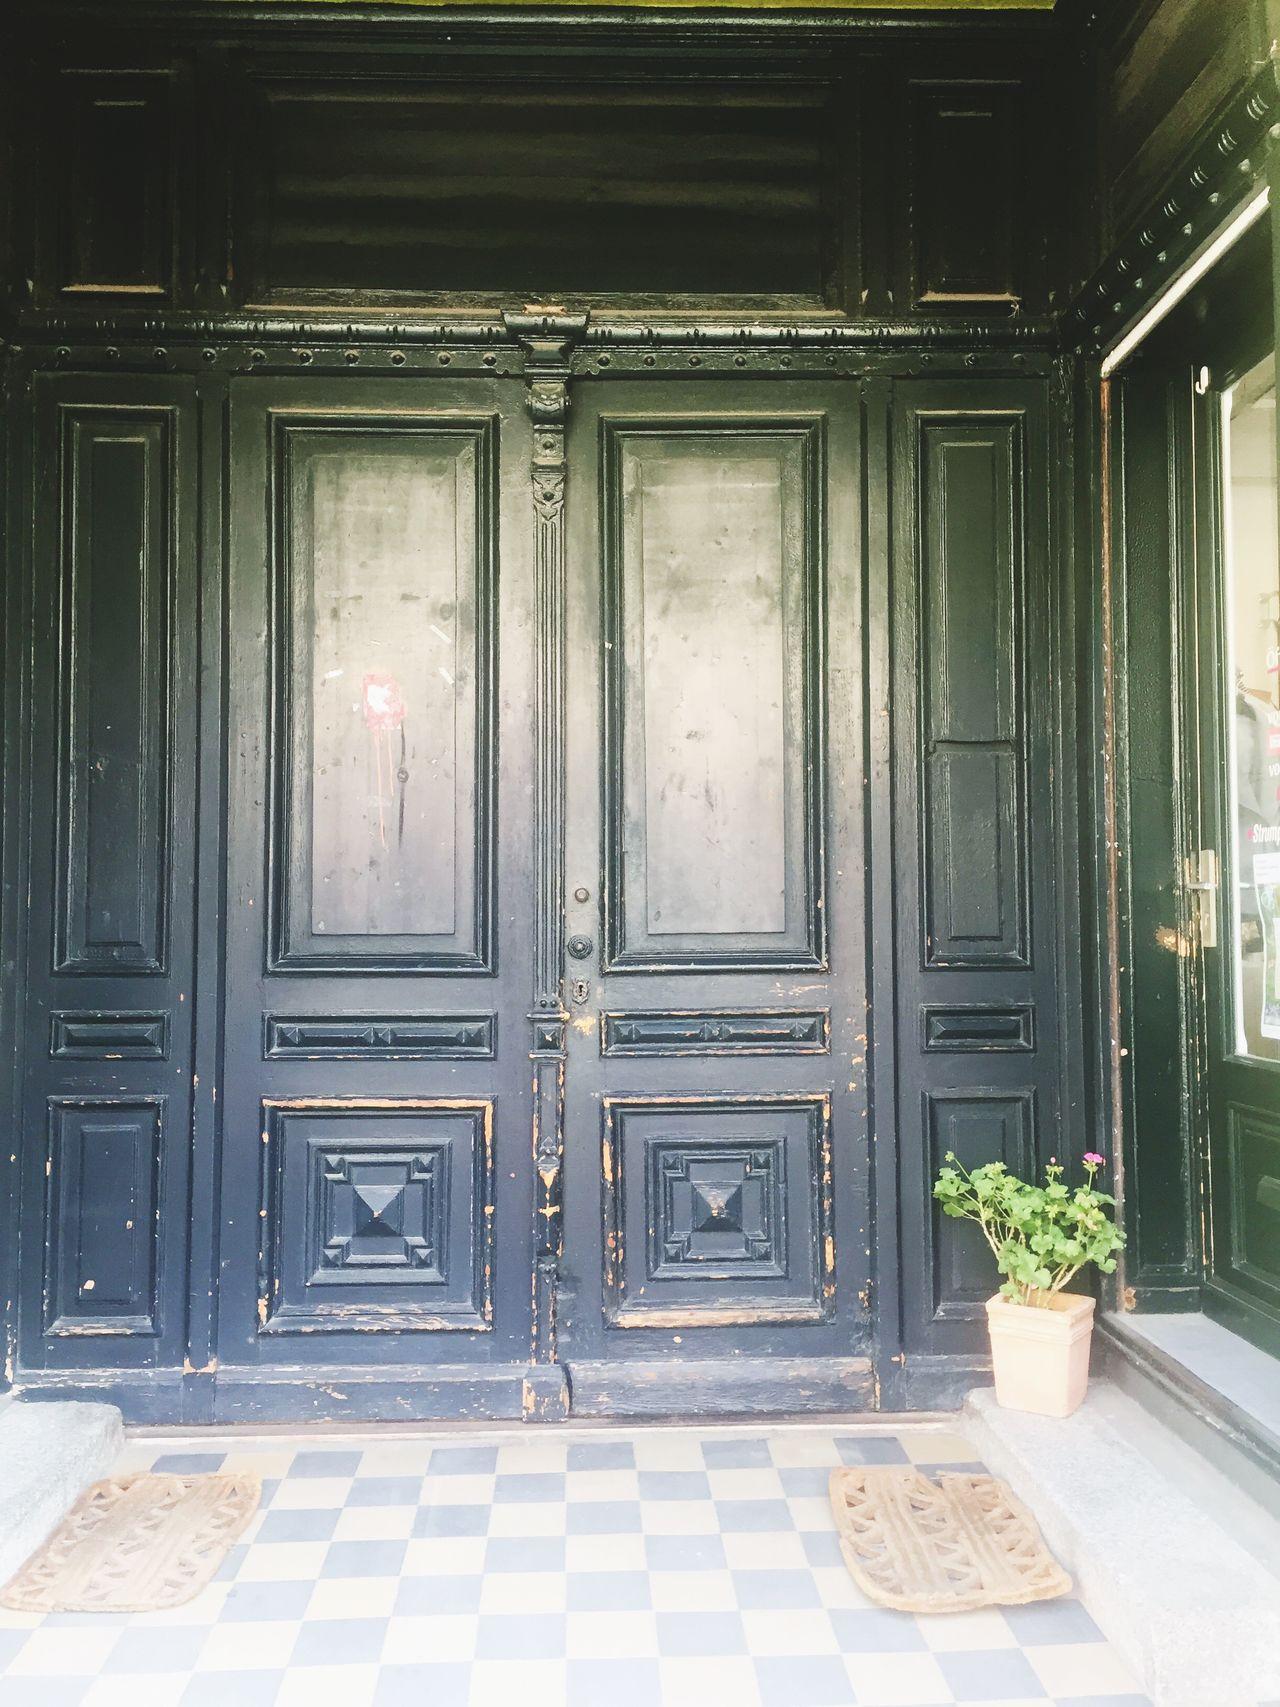 Oldentry Wooddoor Shopentry Vintage Shabby Bluedoor Oldtiles Doormats Checked Tiles